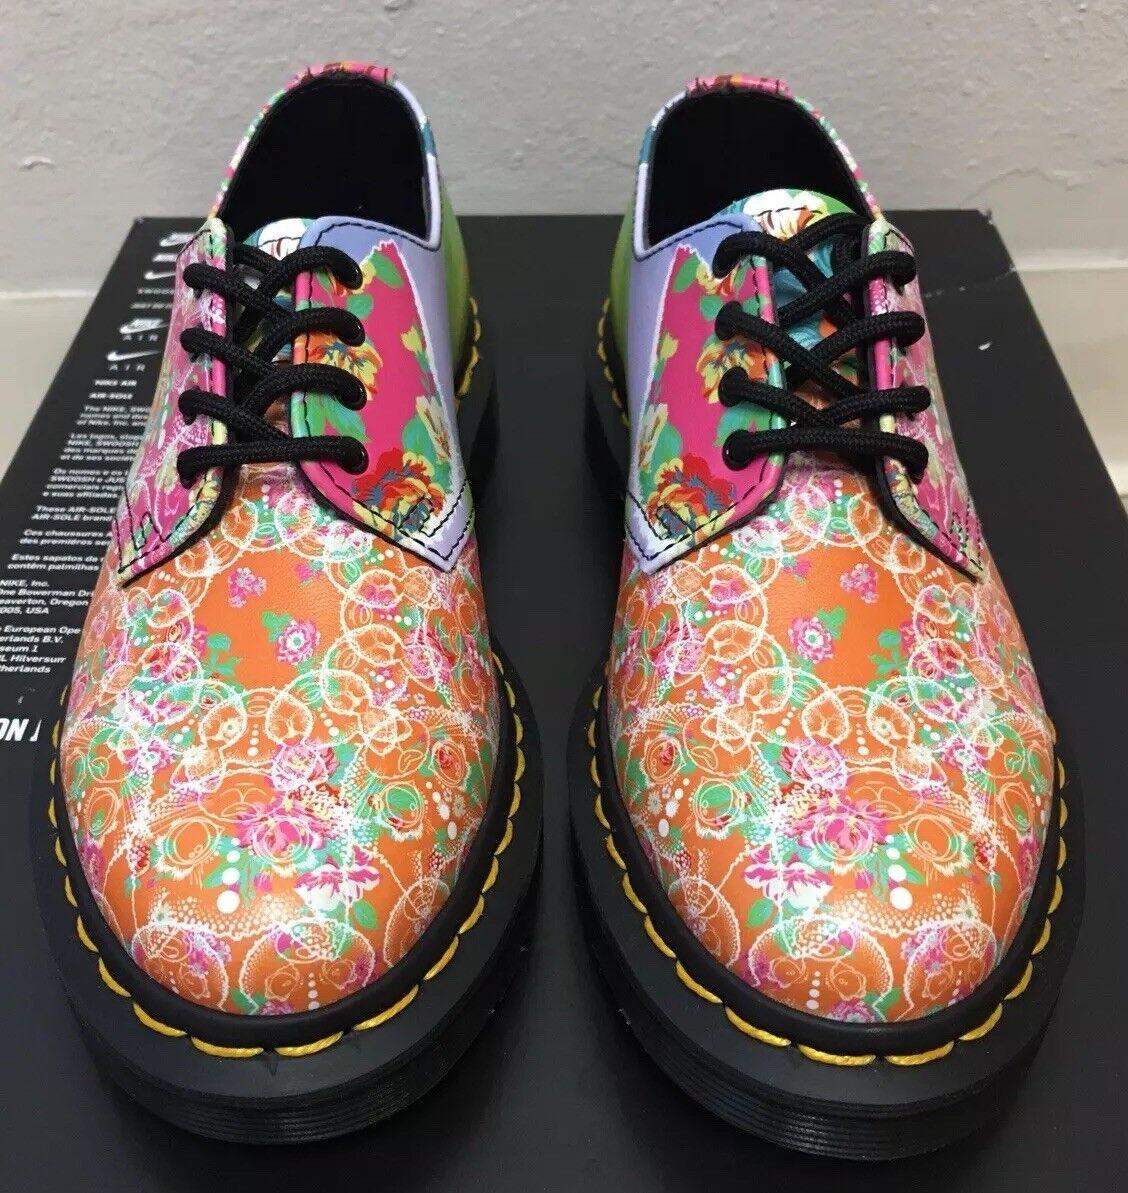 Dr Martens Smiths Daze 4 Eye Oxford shoes Floral Multi Women Size 5